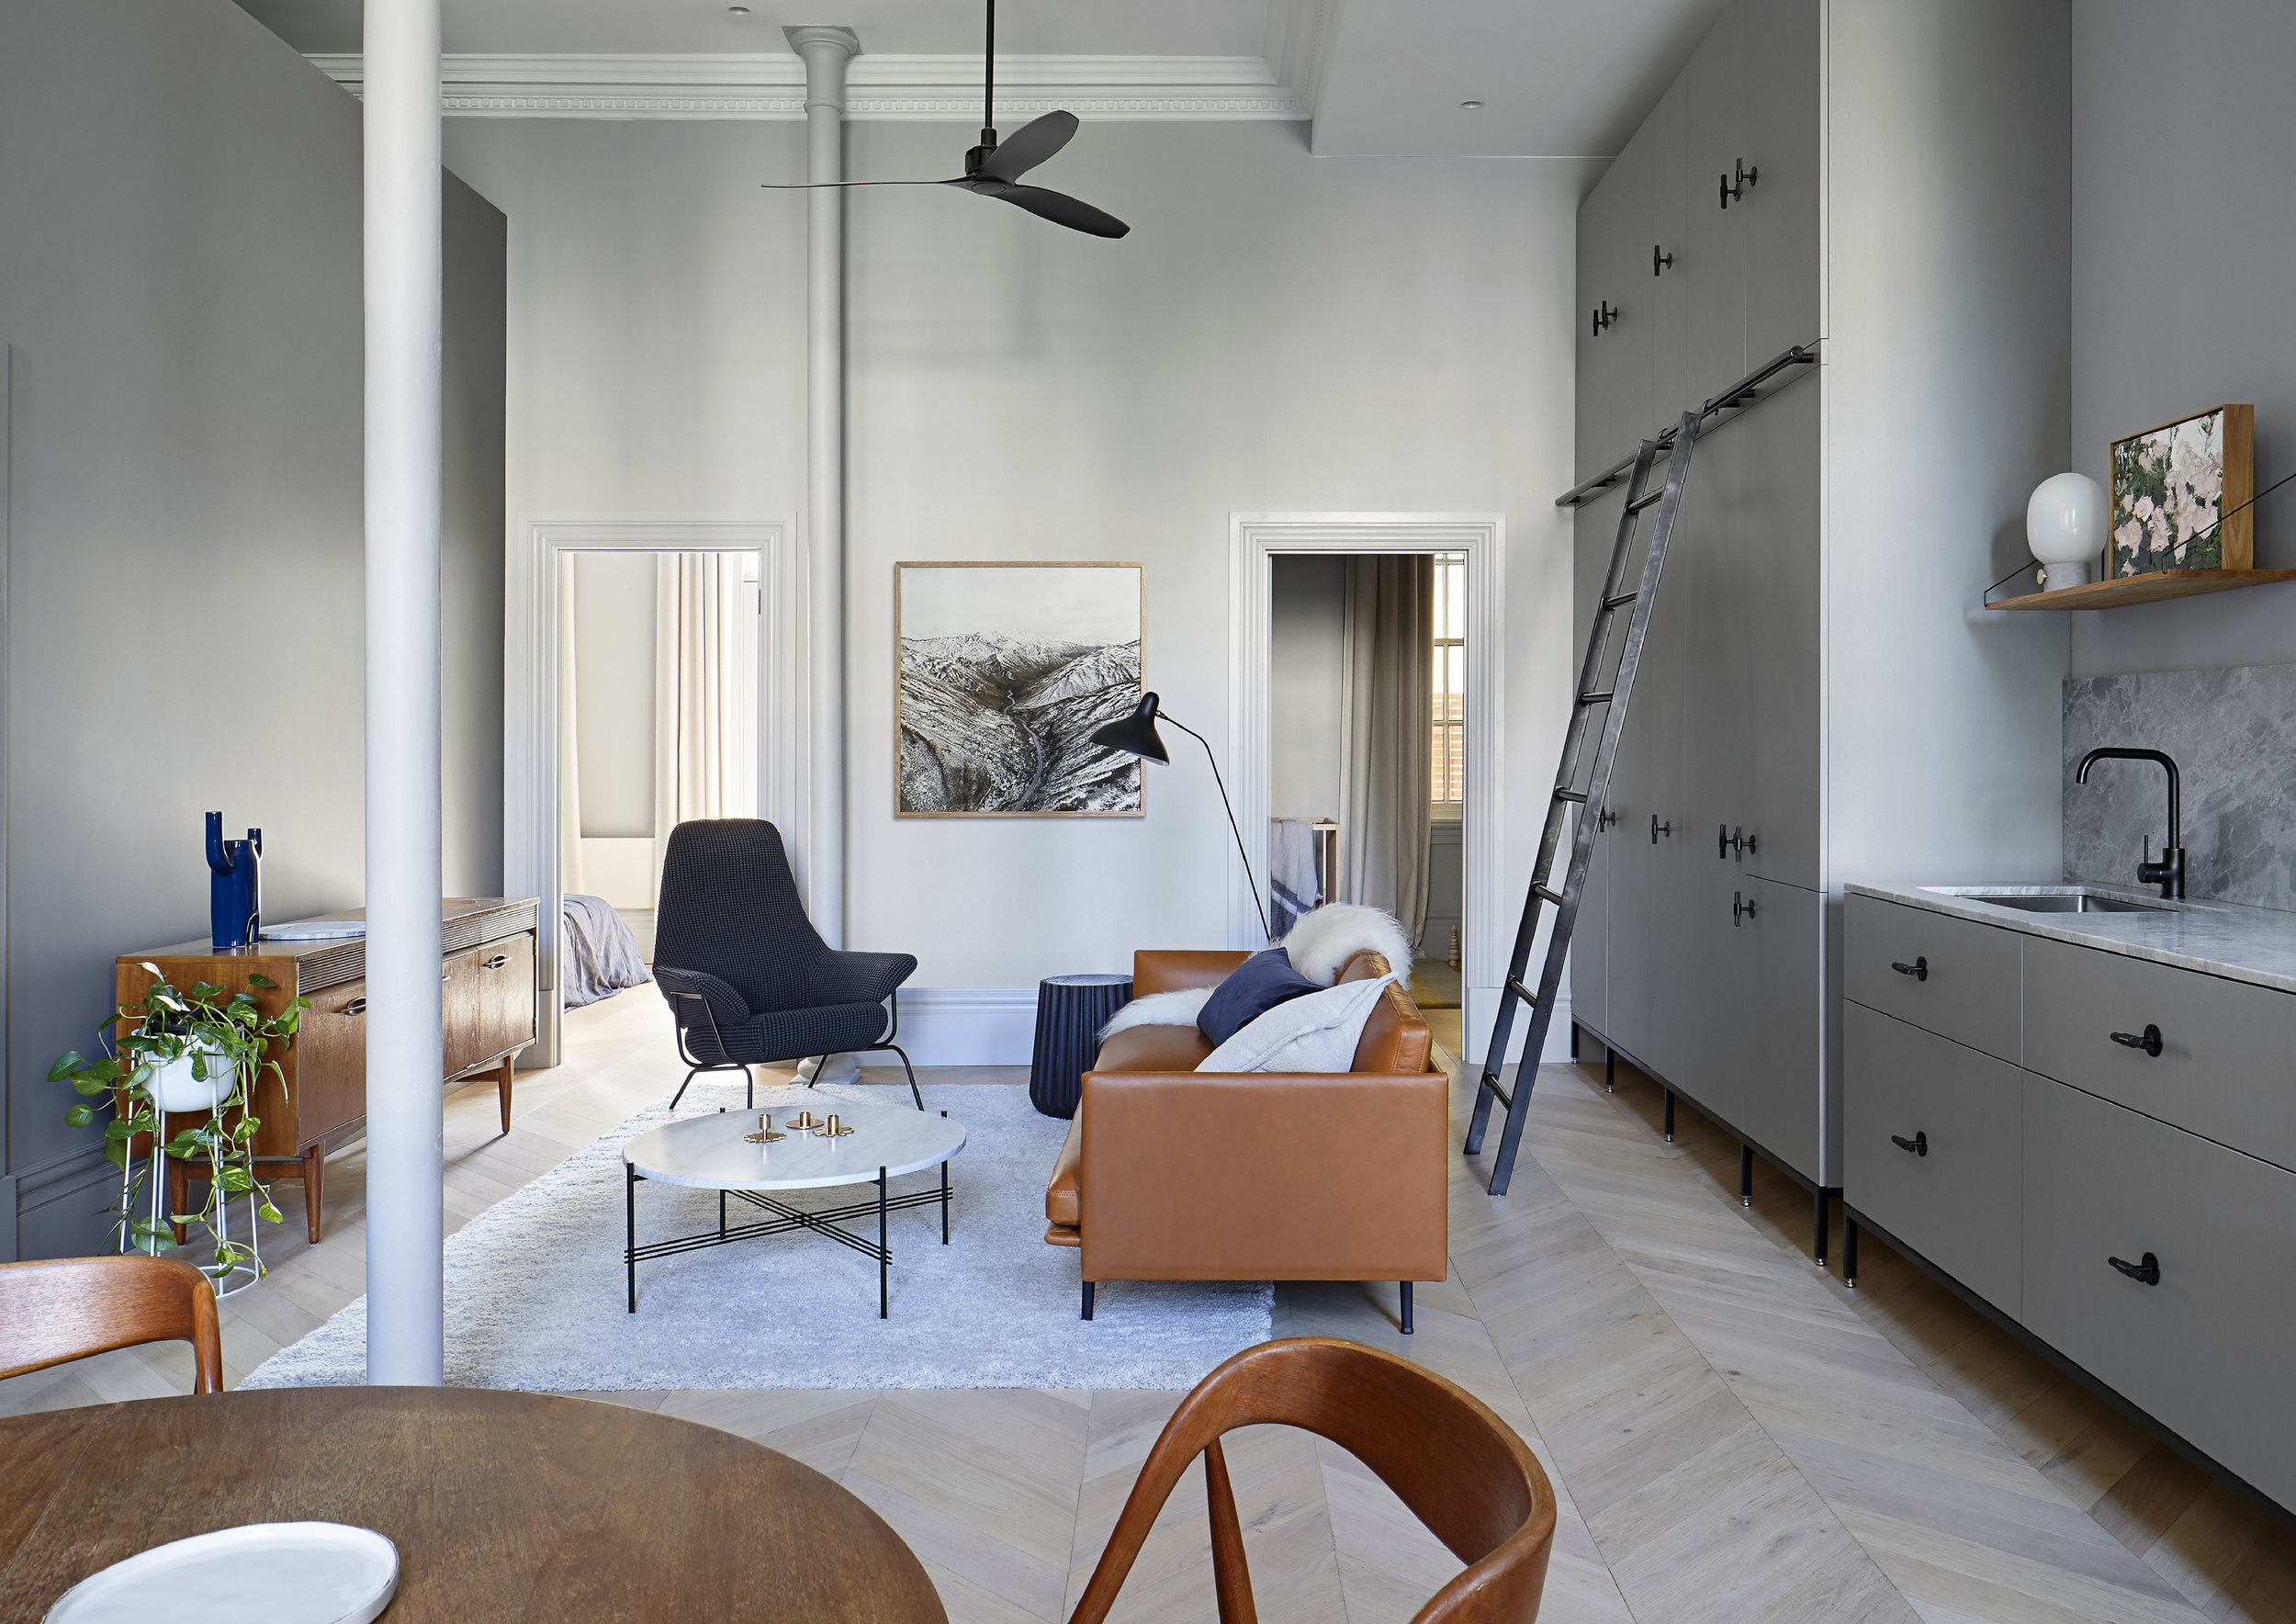 techne-kew-apartment-sarah-wolfendale-melbourne-sm-8888.jpg